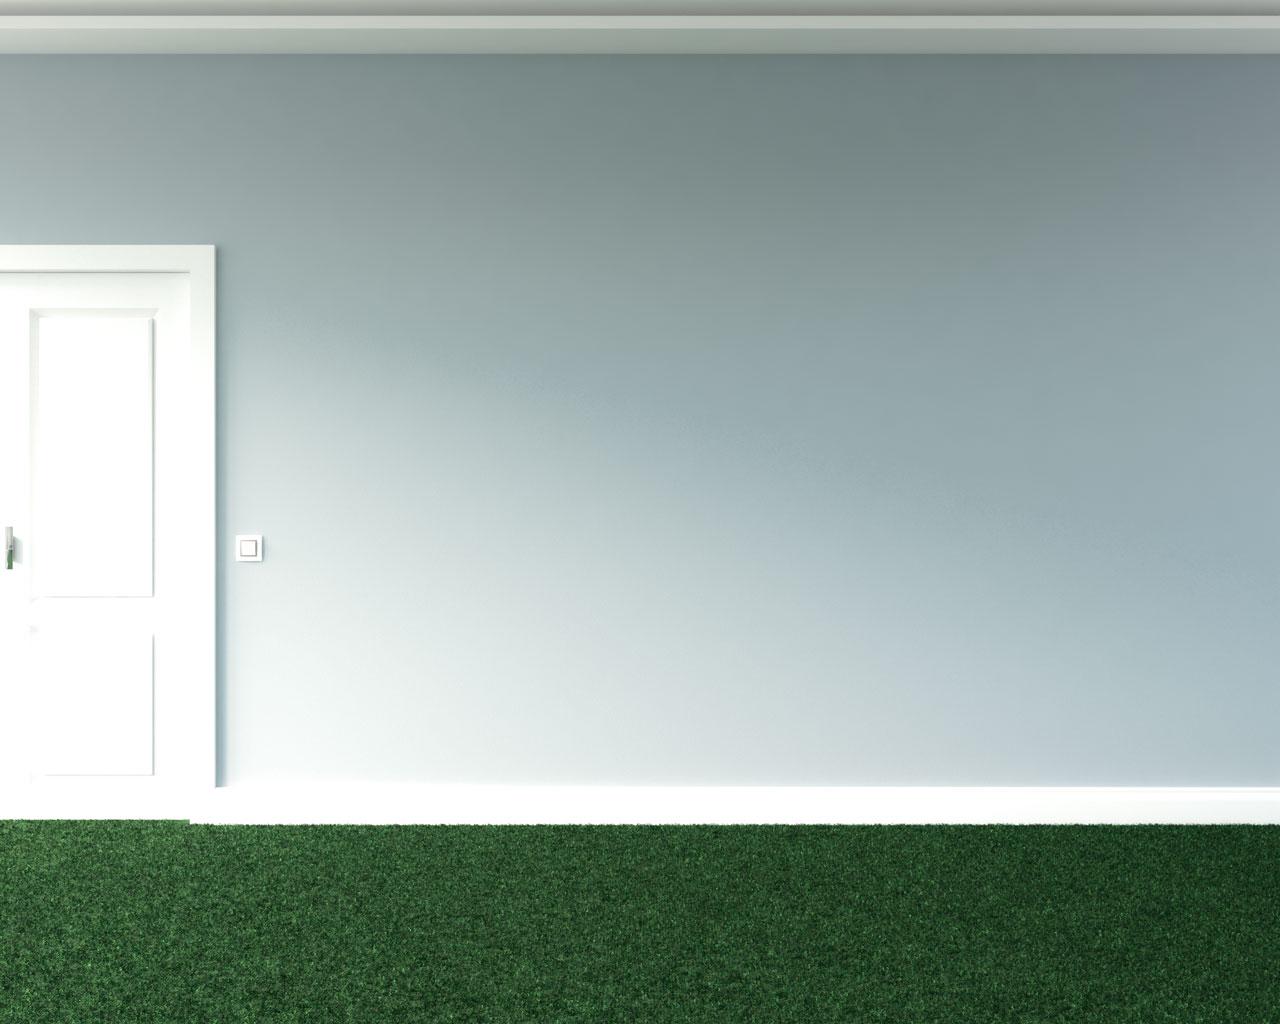 Green carpet flooring with grayish blue wall